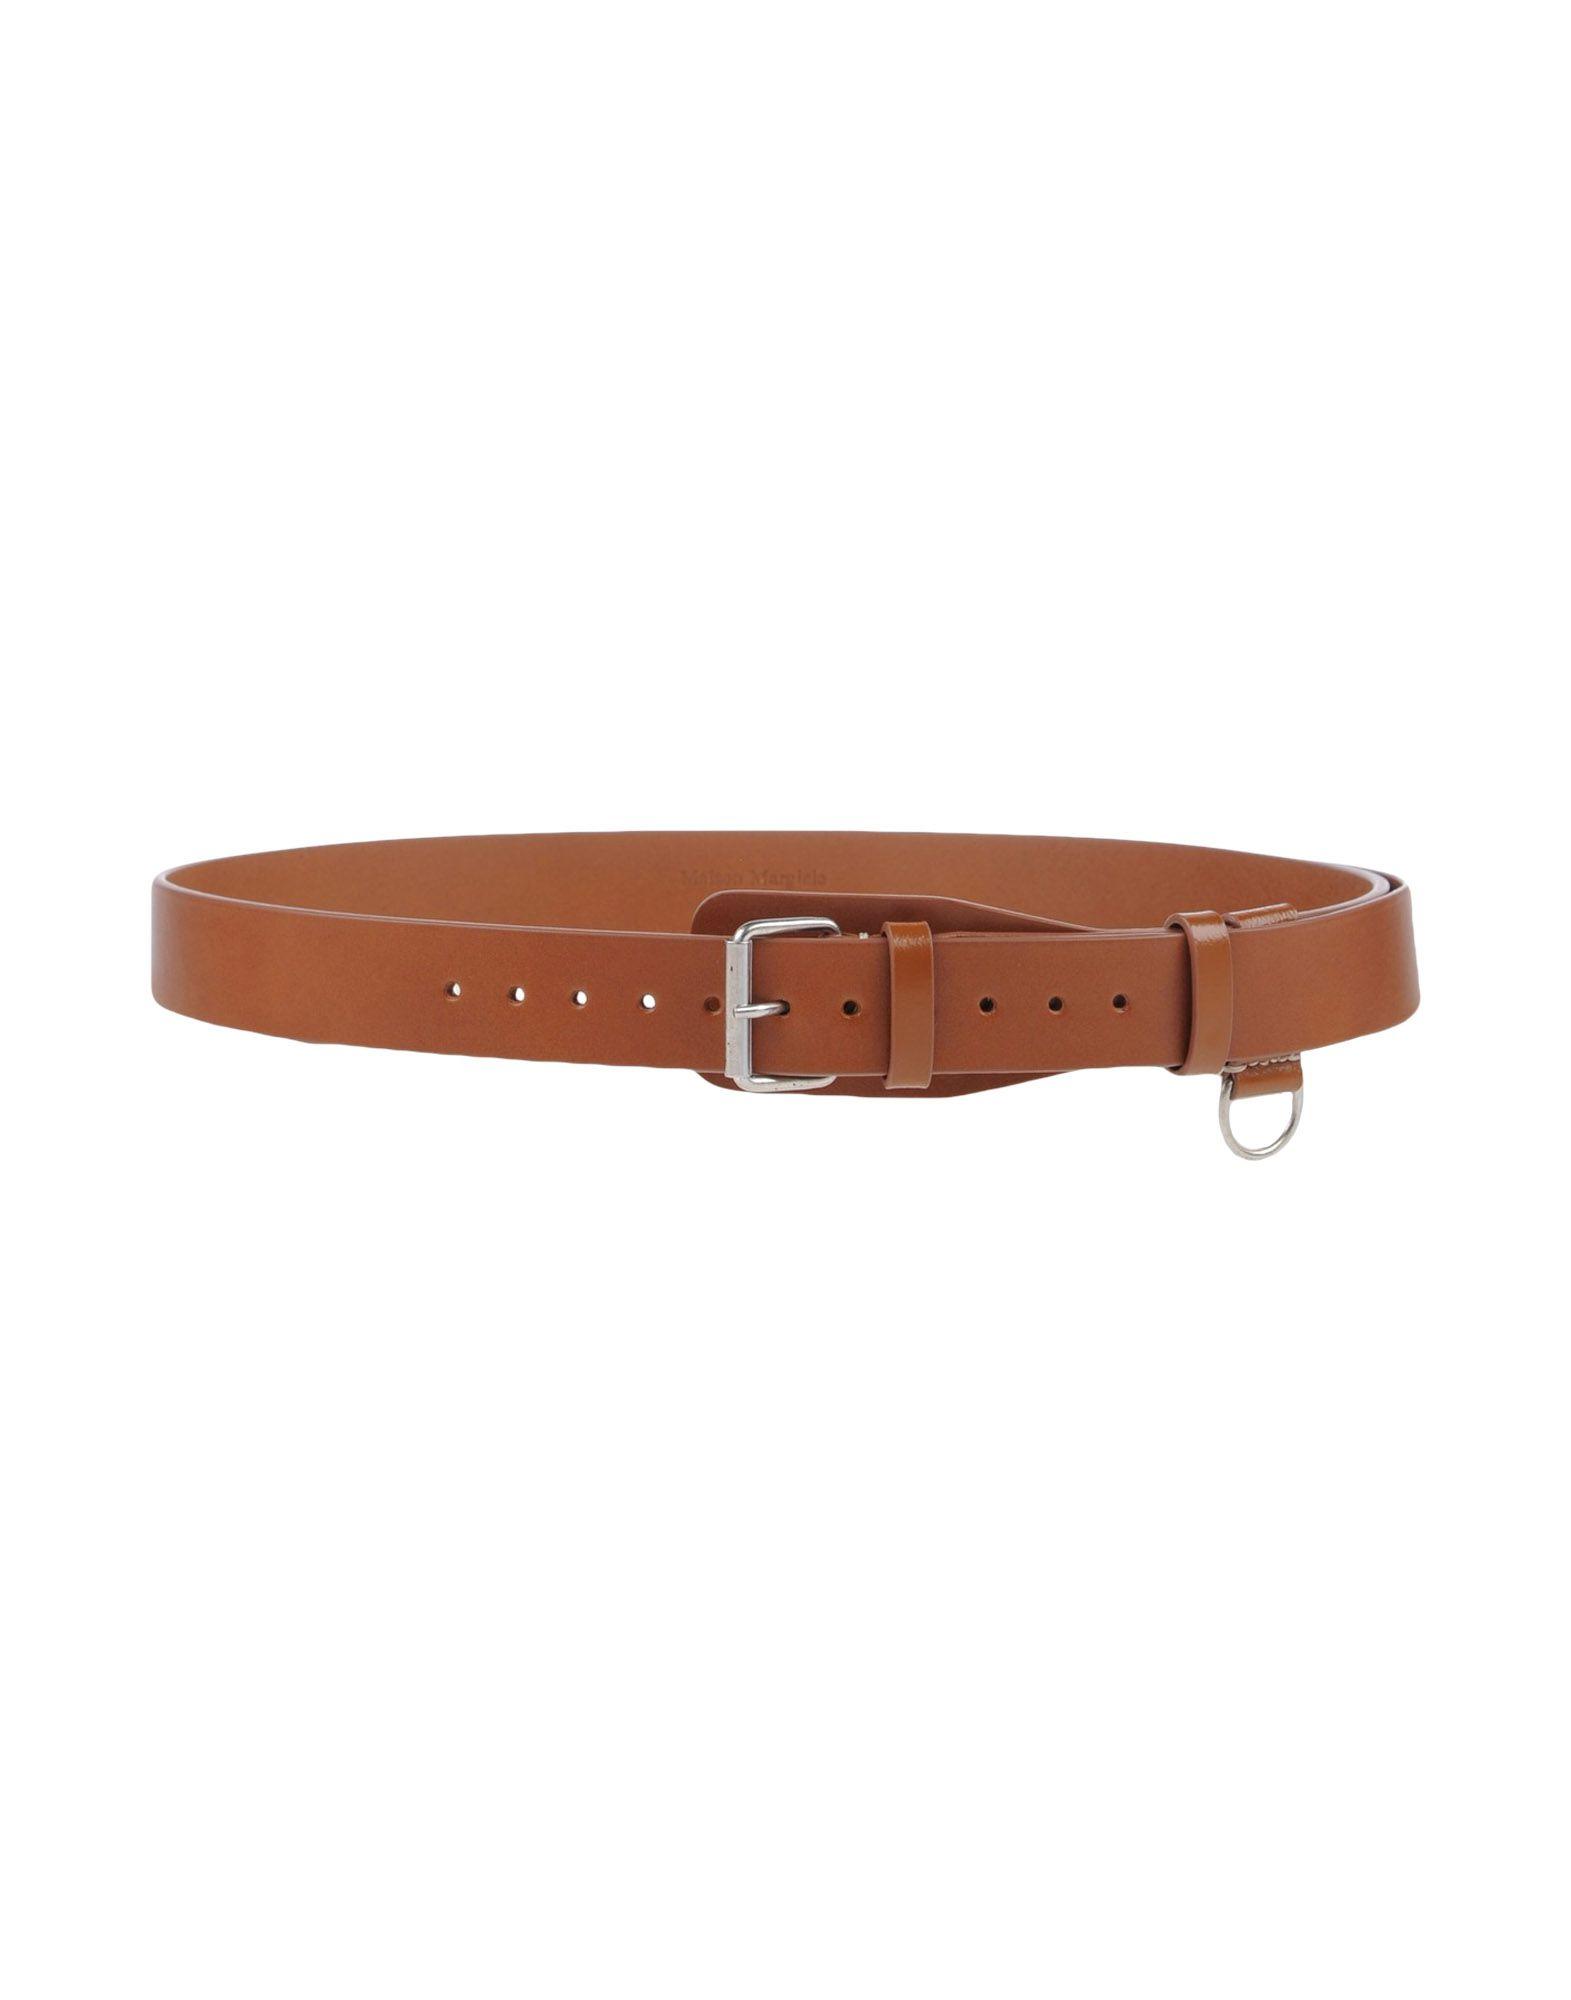 Small Leather Goods - Belts Virreina kjsUHrtB